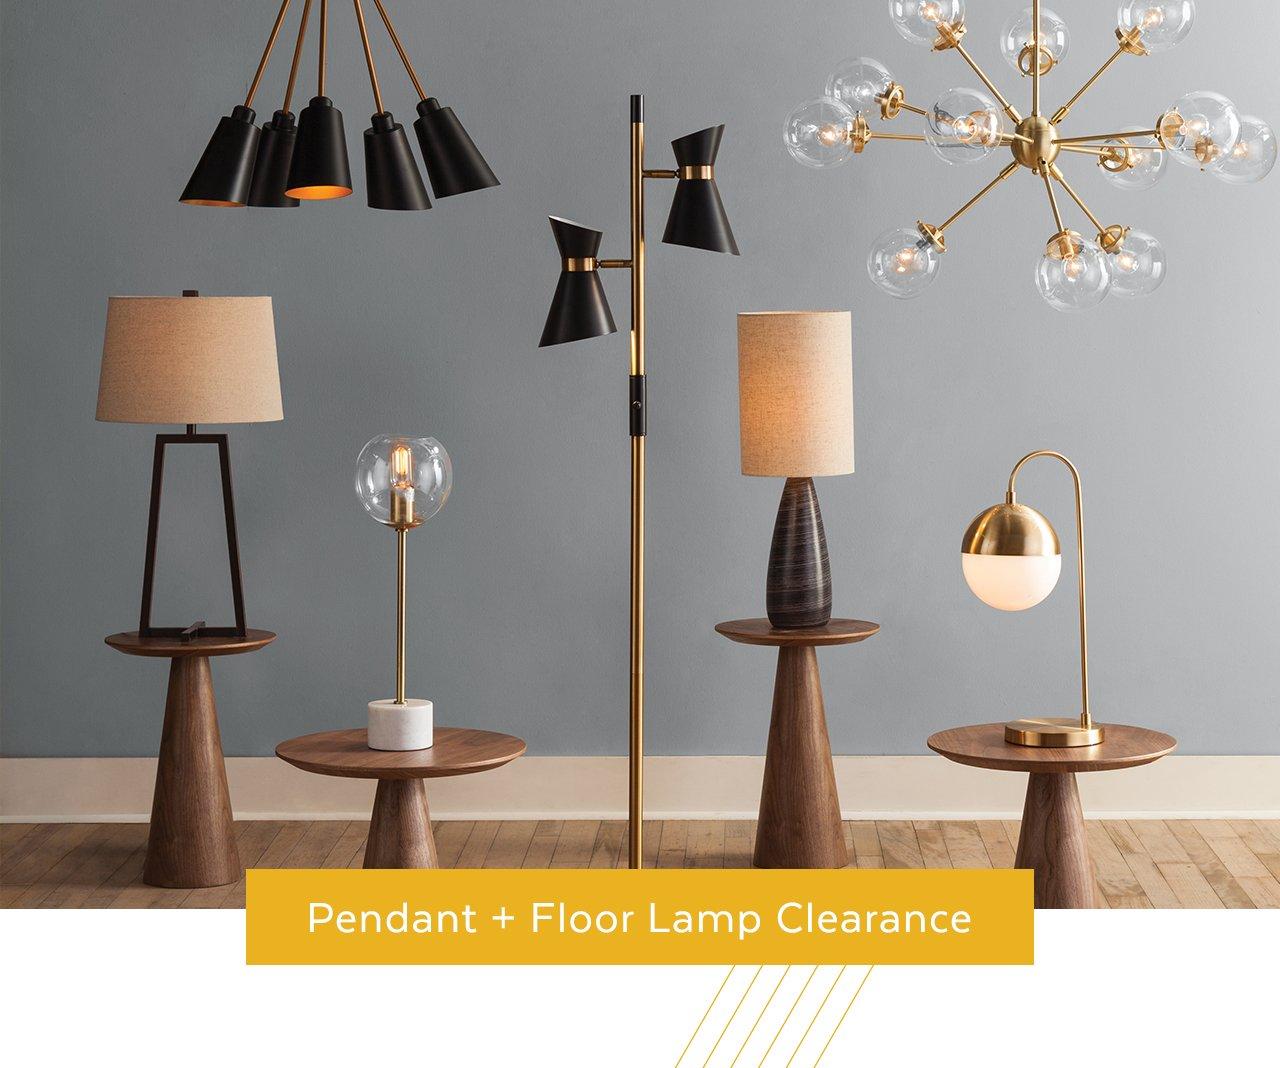 Pendant + Floor Lamp Clearance